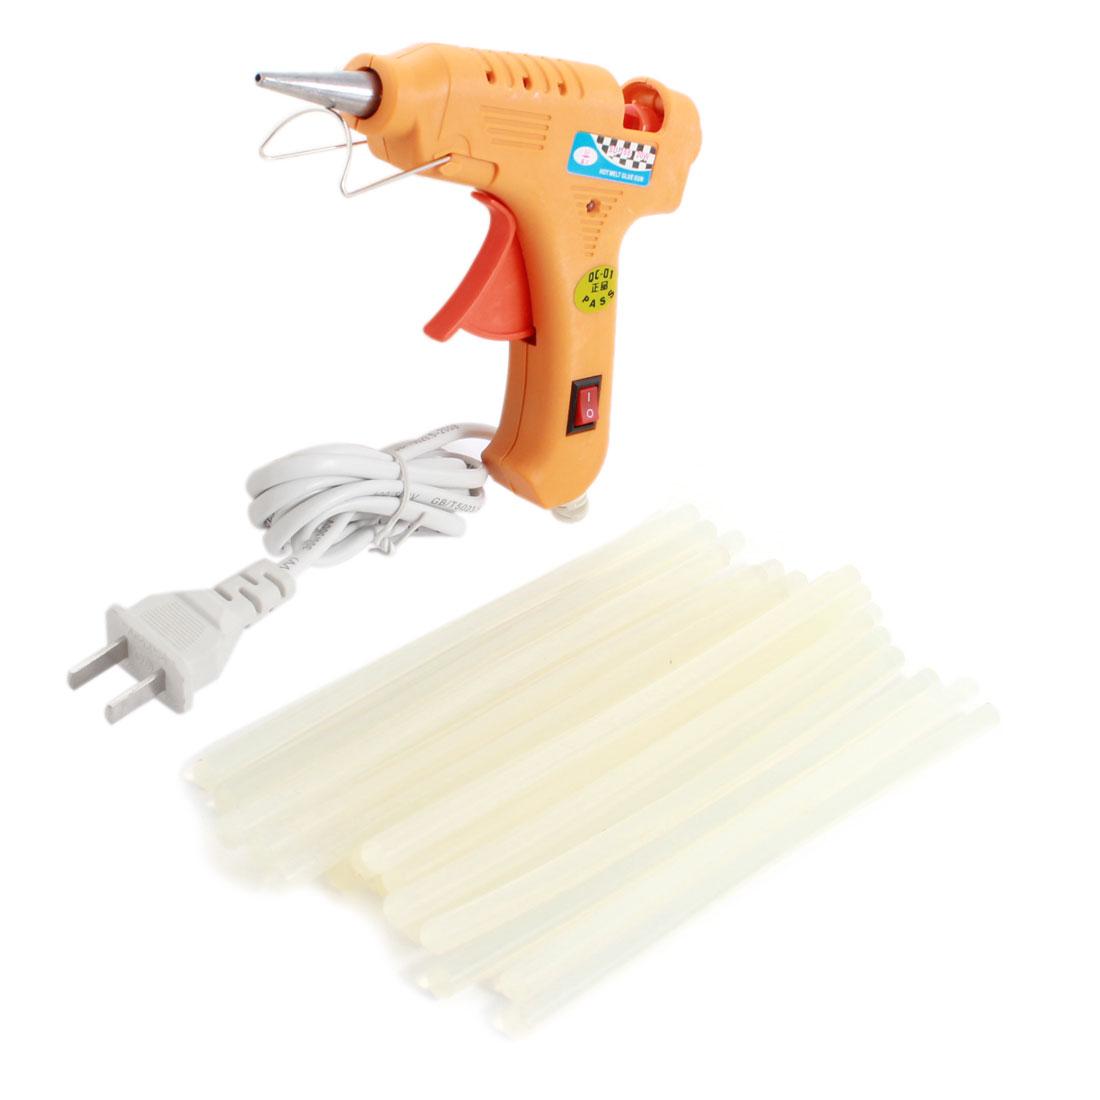 AC100V-240V US Plug Plastic Shell Arts Craft Crafting 20W Yellow Glue Gun + 20Pcs 7x200mm Hot Melt Adhesive Sticks